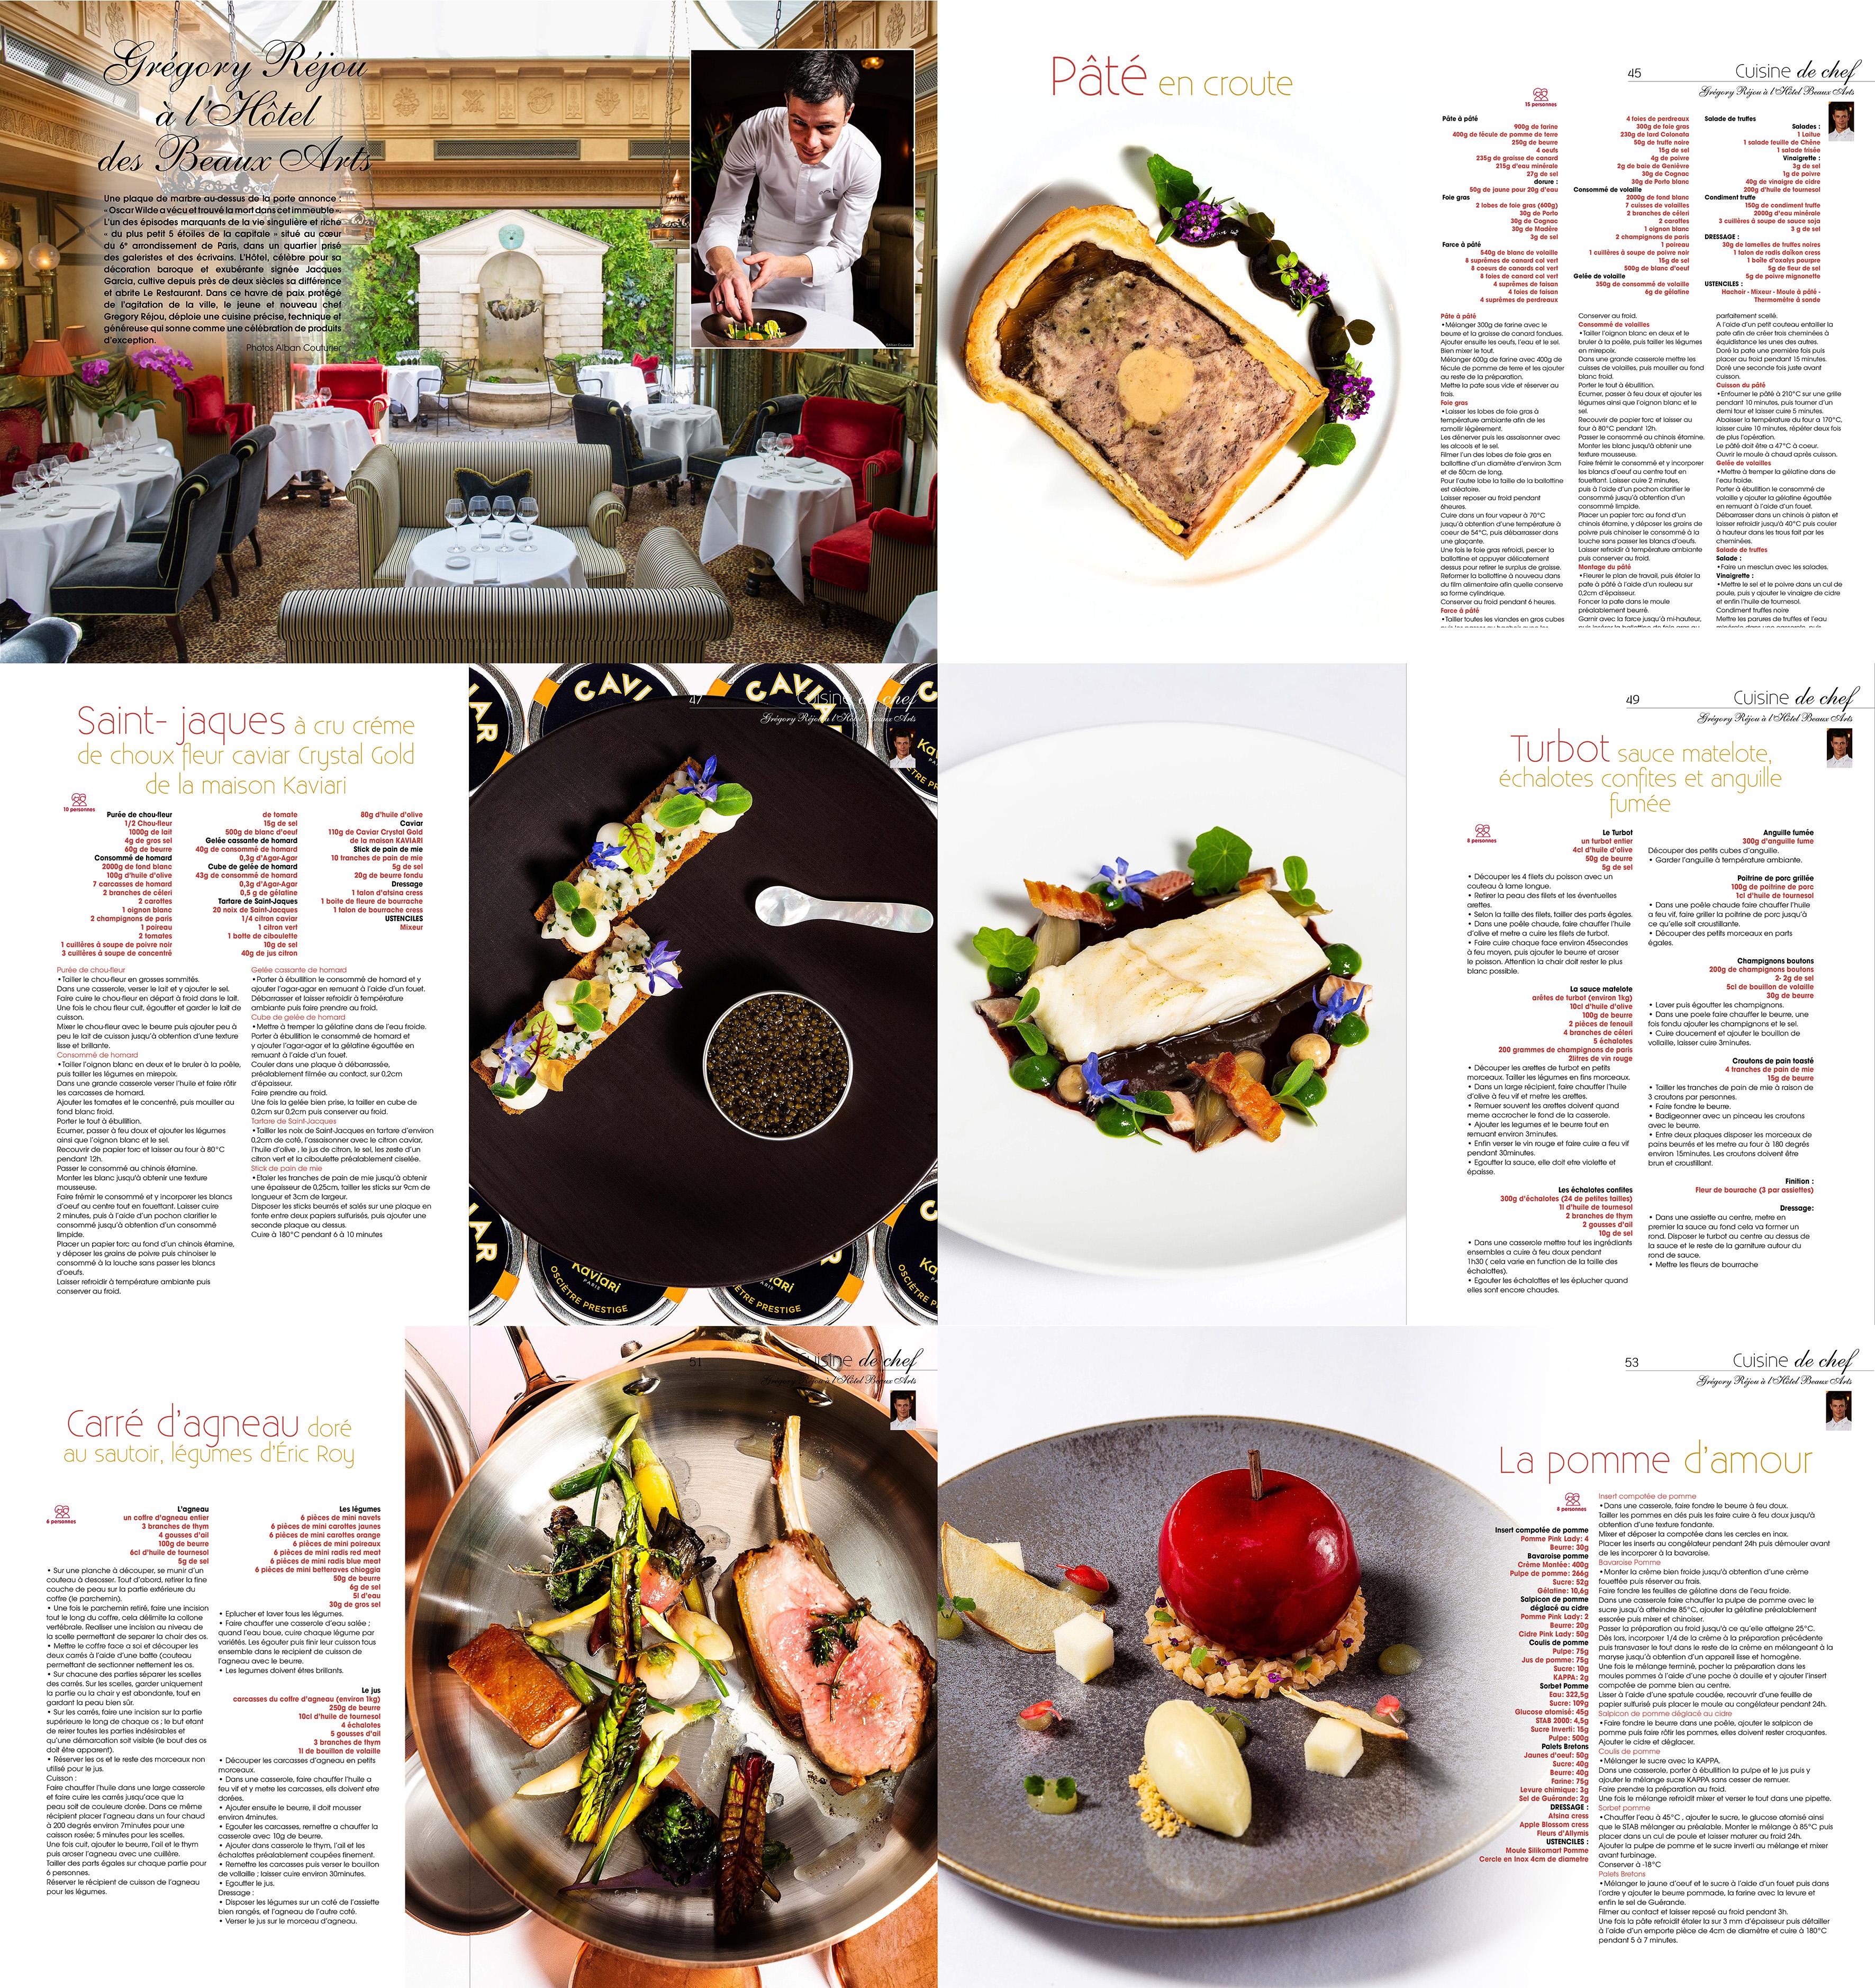 Cuisine A&D mars 2019, Gregry Rejou, chef executif, Hotel, rue des beaux arts, Paris , ©aAlban Couturier